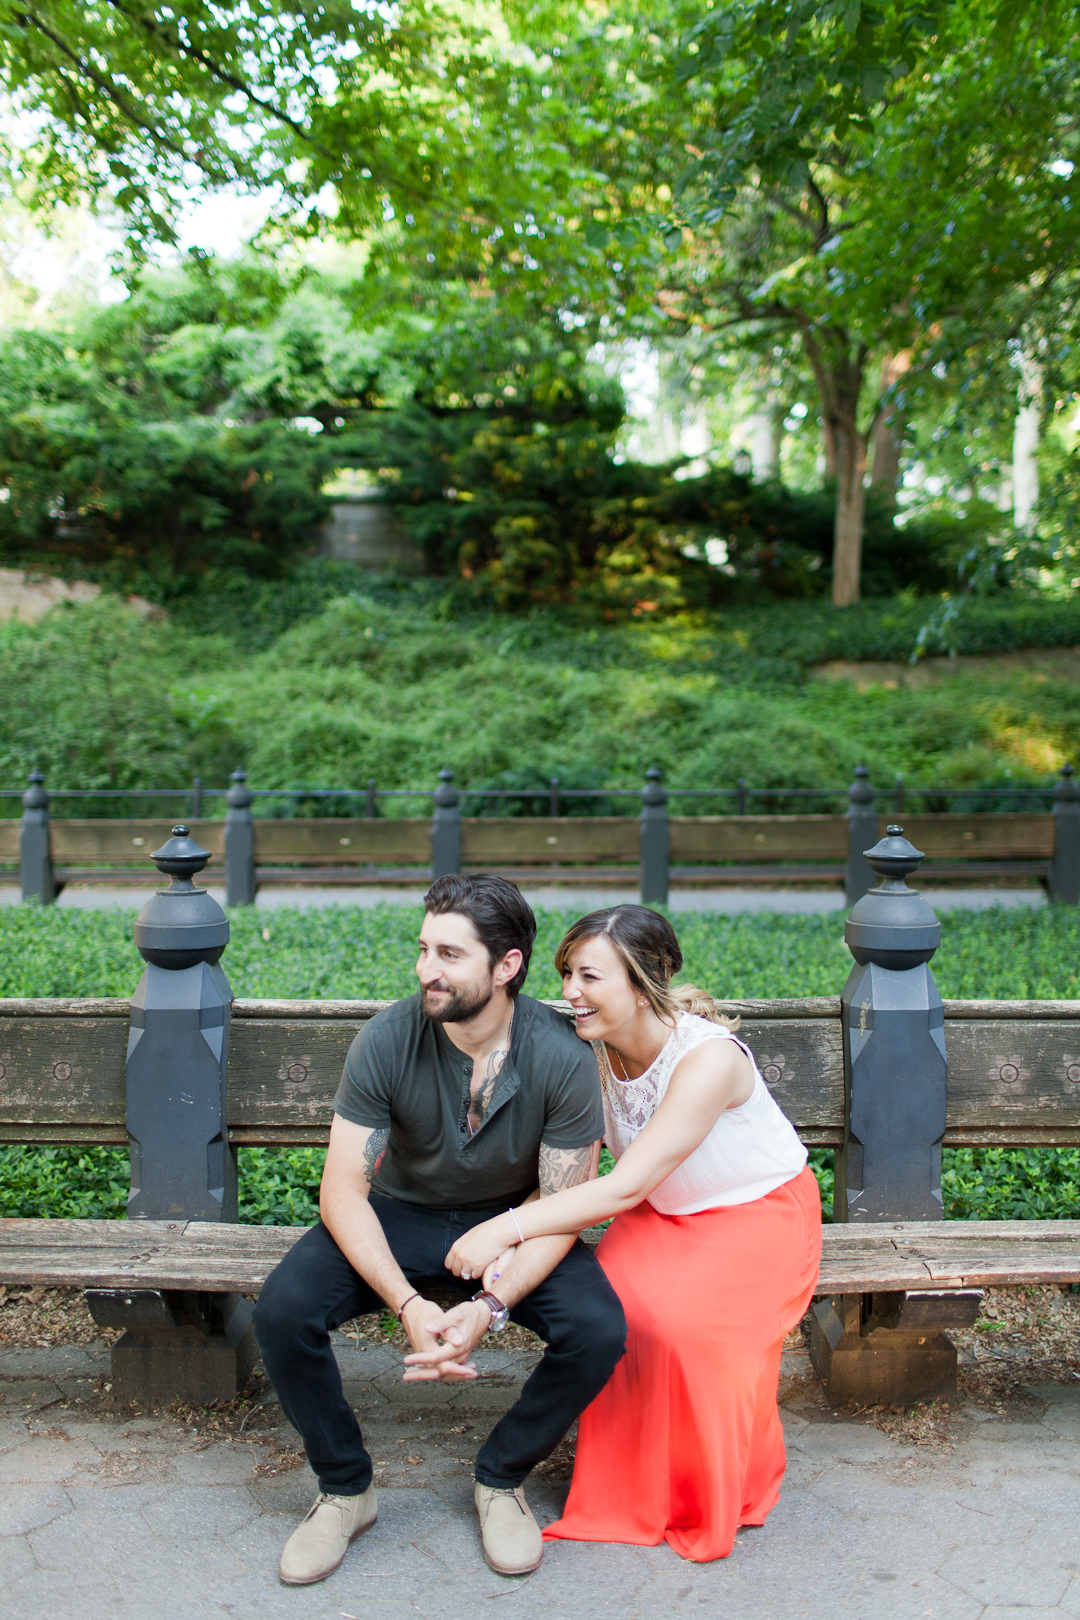 Melissa Kruse Photography - Eileen & Kenny Engagement Photos-111.jpg